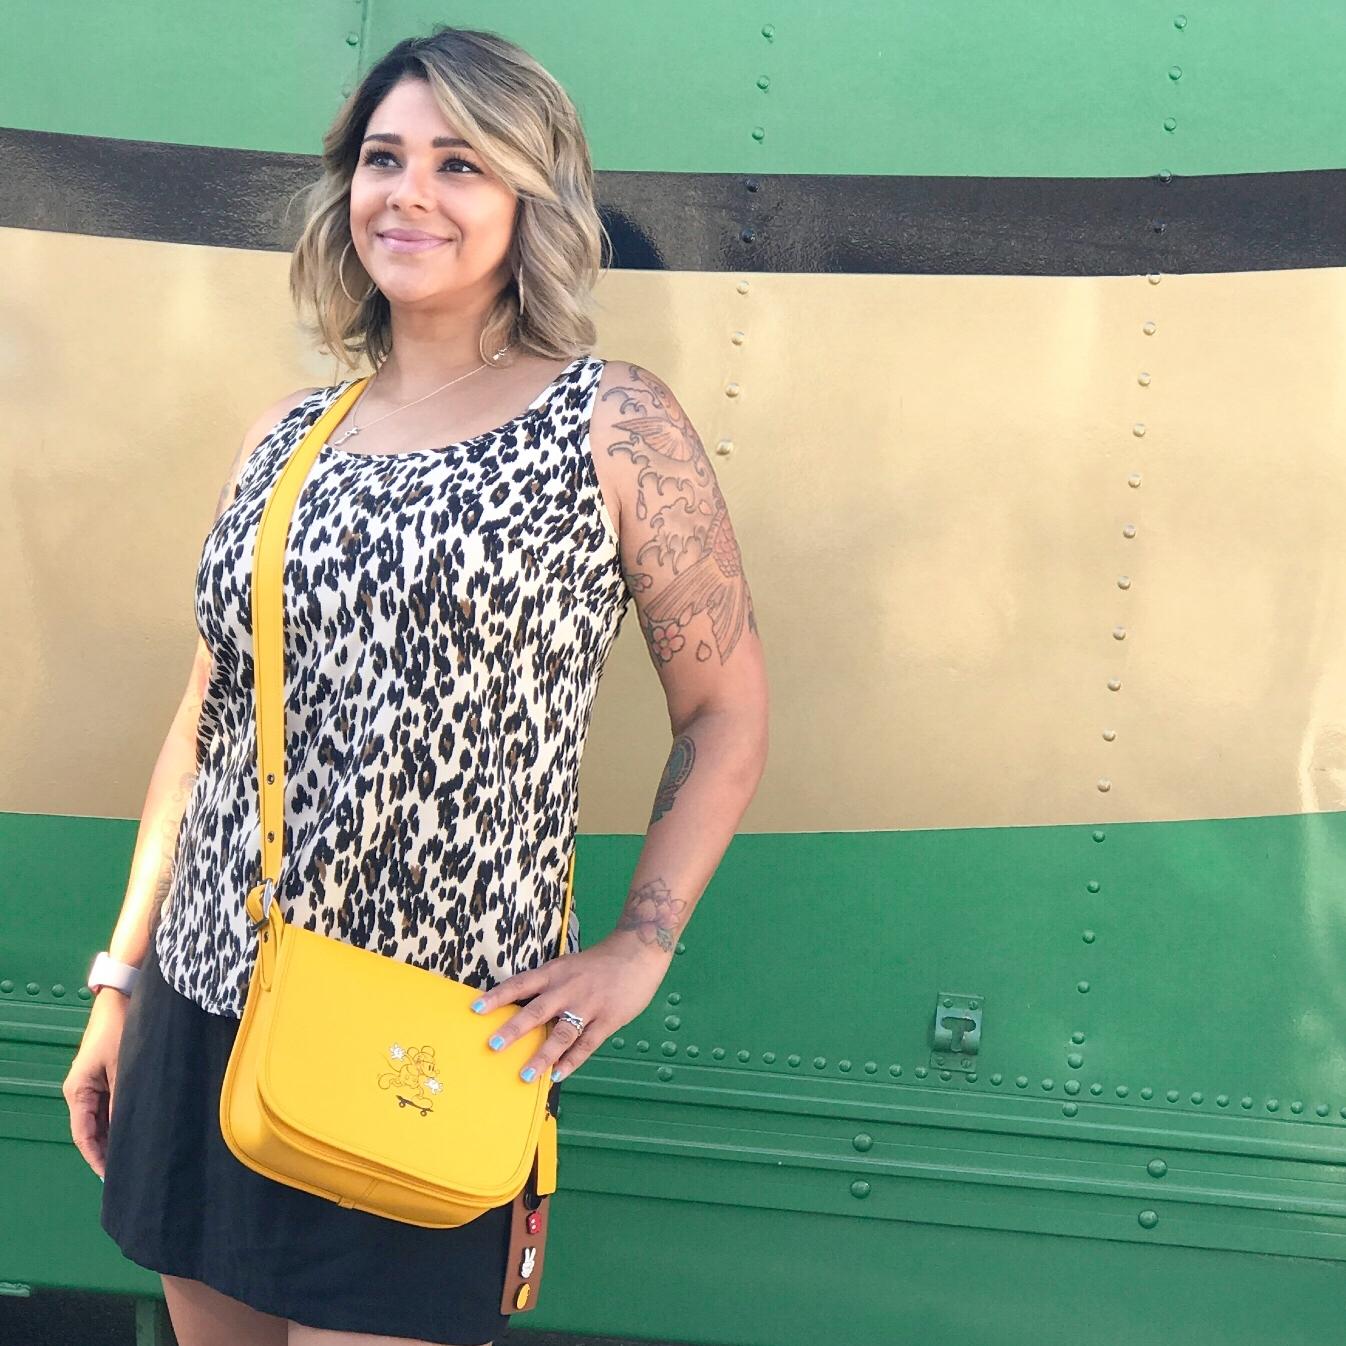 Disney X Coach Handbag